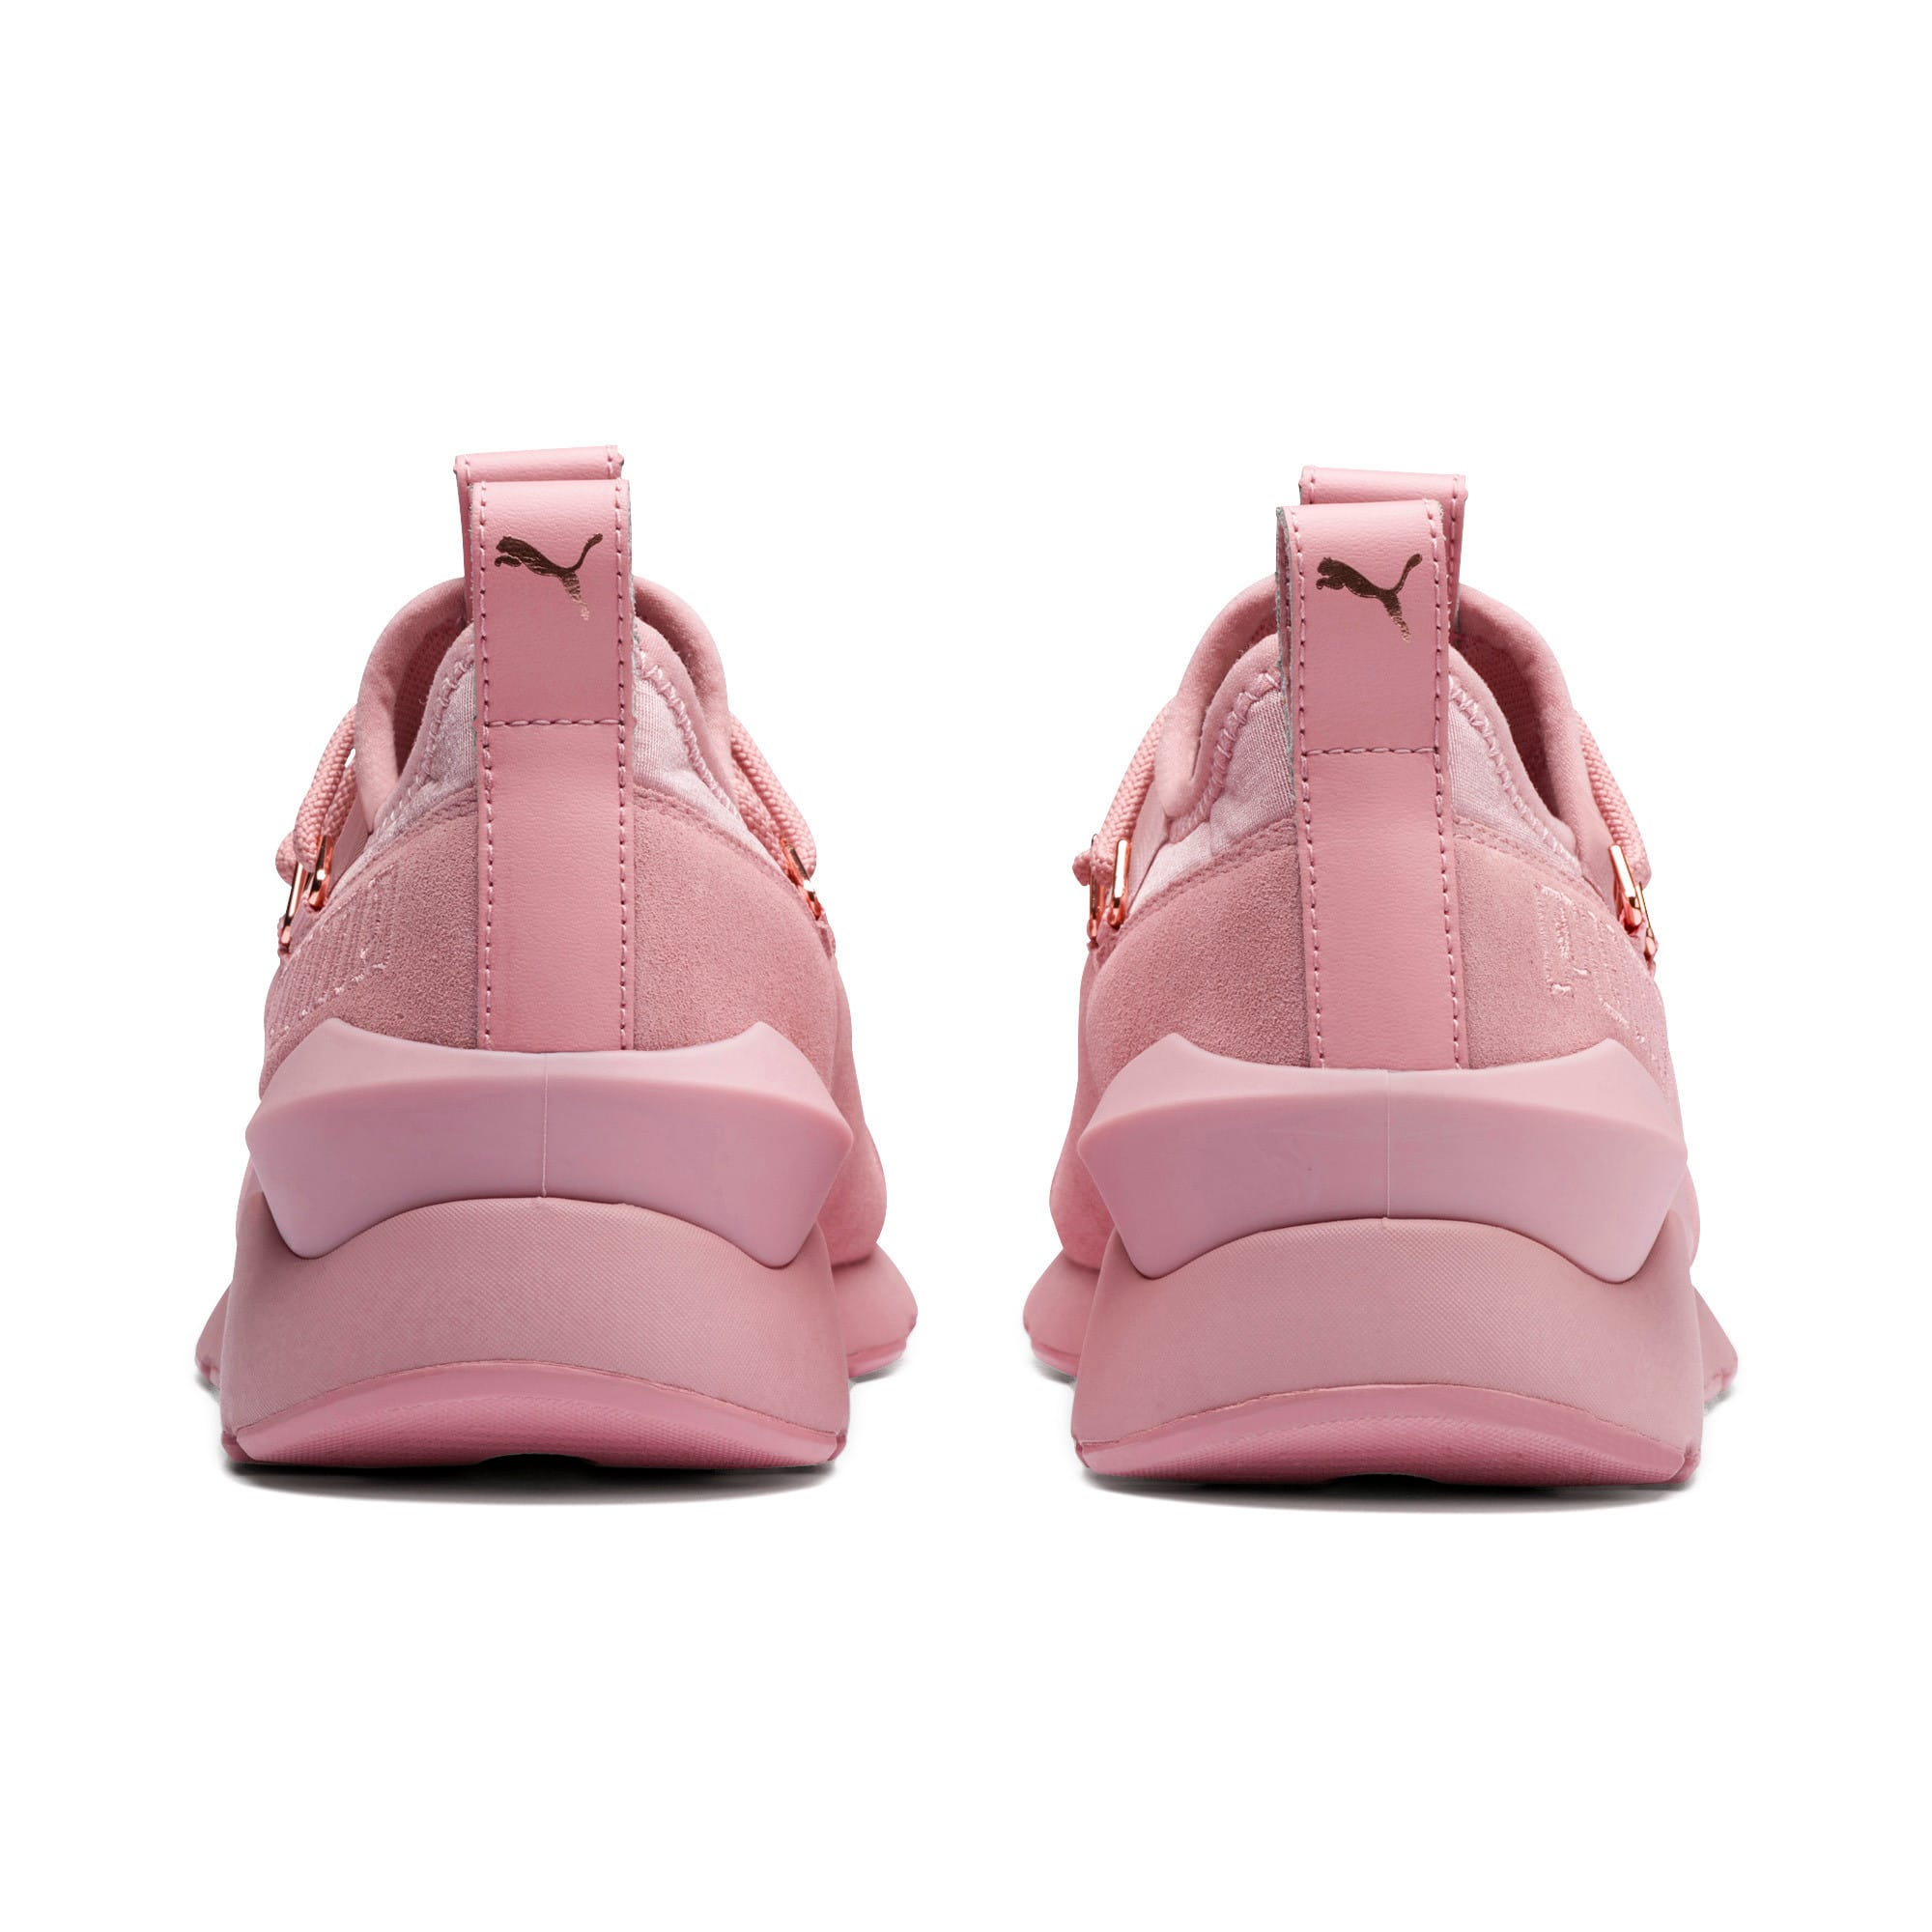 Miniatura 4 de Zapatos deportivos Muse 2 para mujer, Bridal Rose-Bridal Rose, mediano